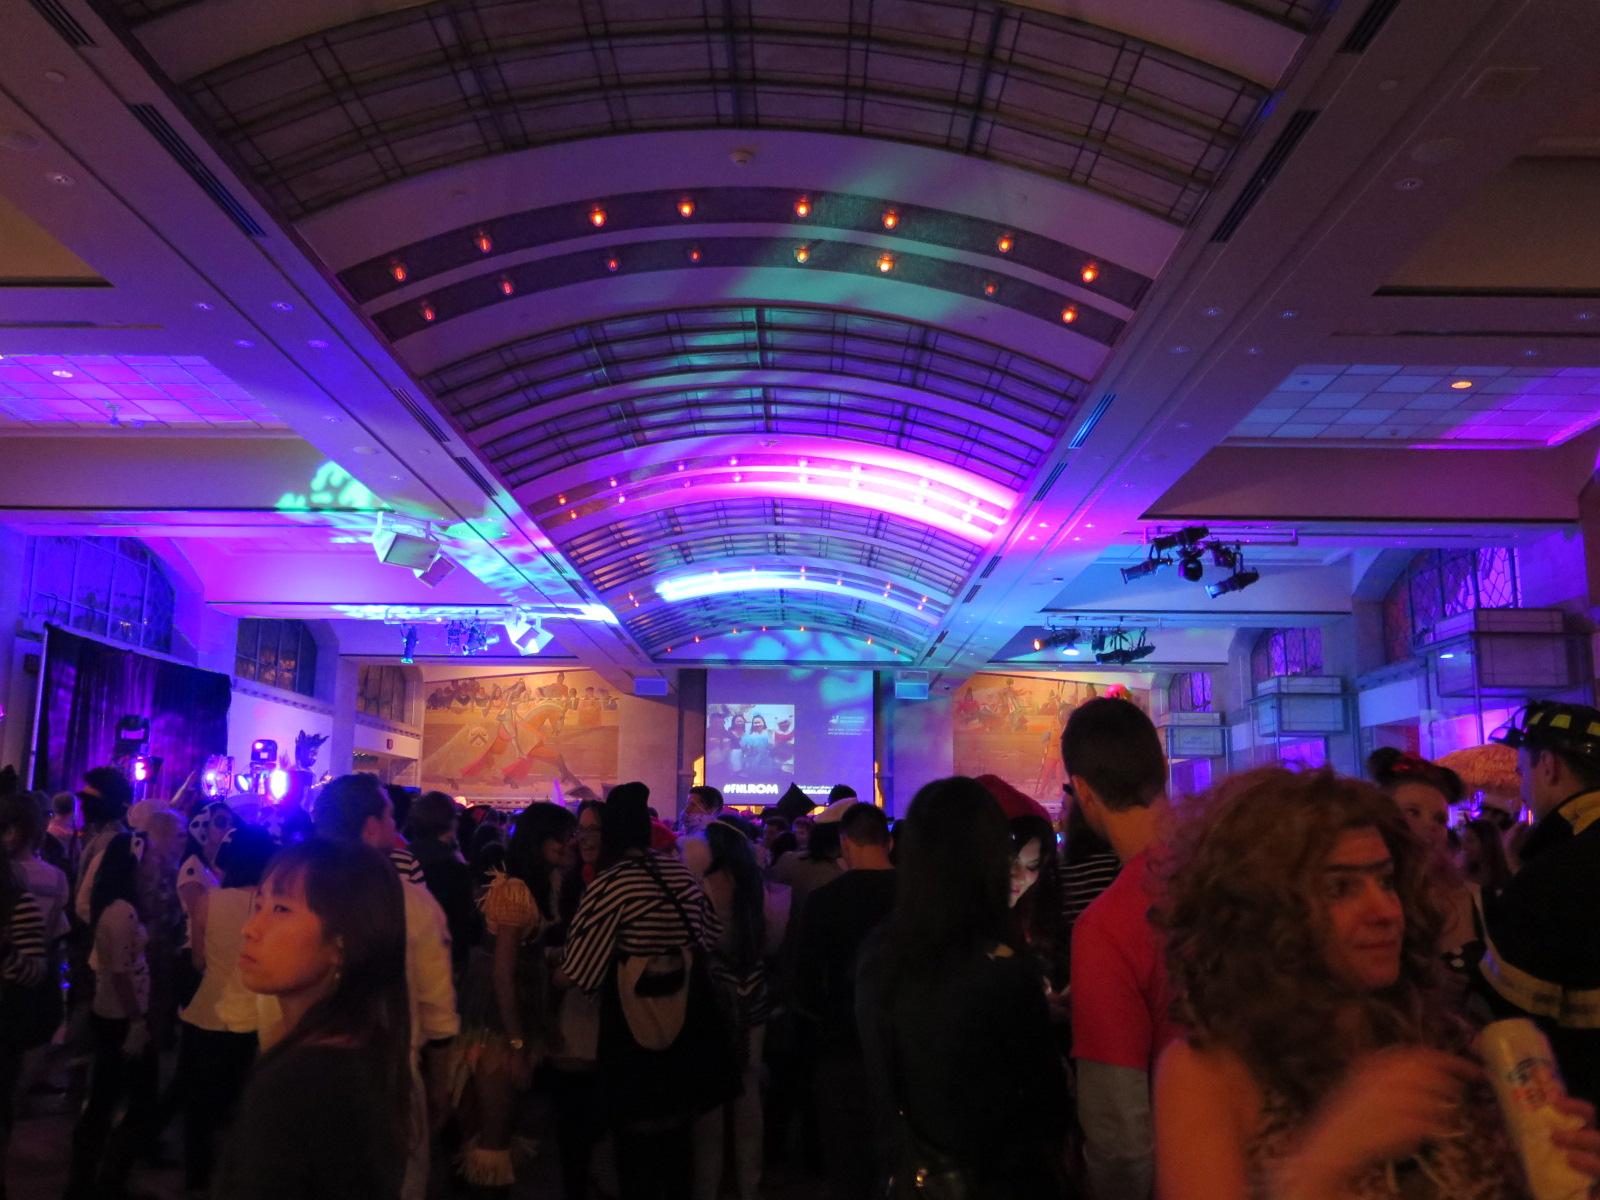 Halloween at the rom julianna yu 39 s blog for Halloween dance floor ideas